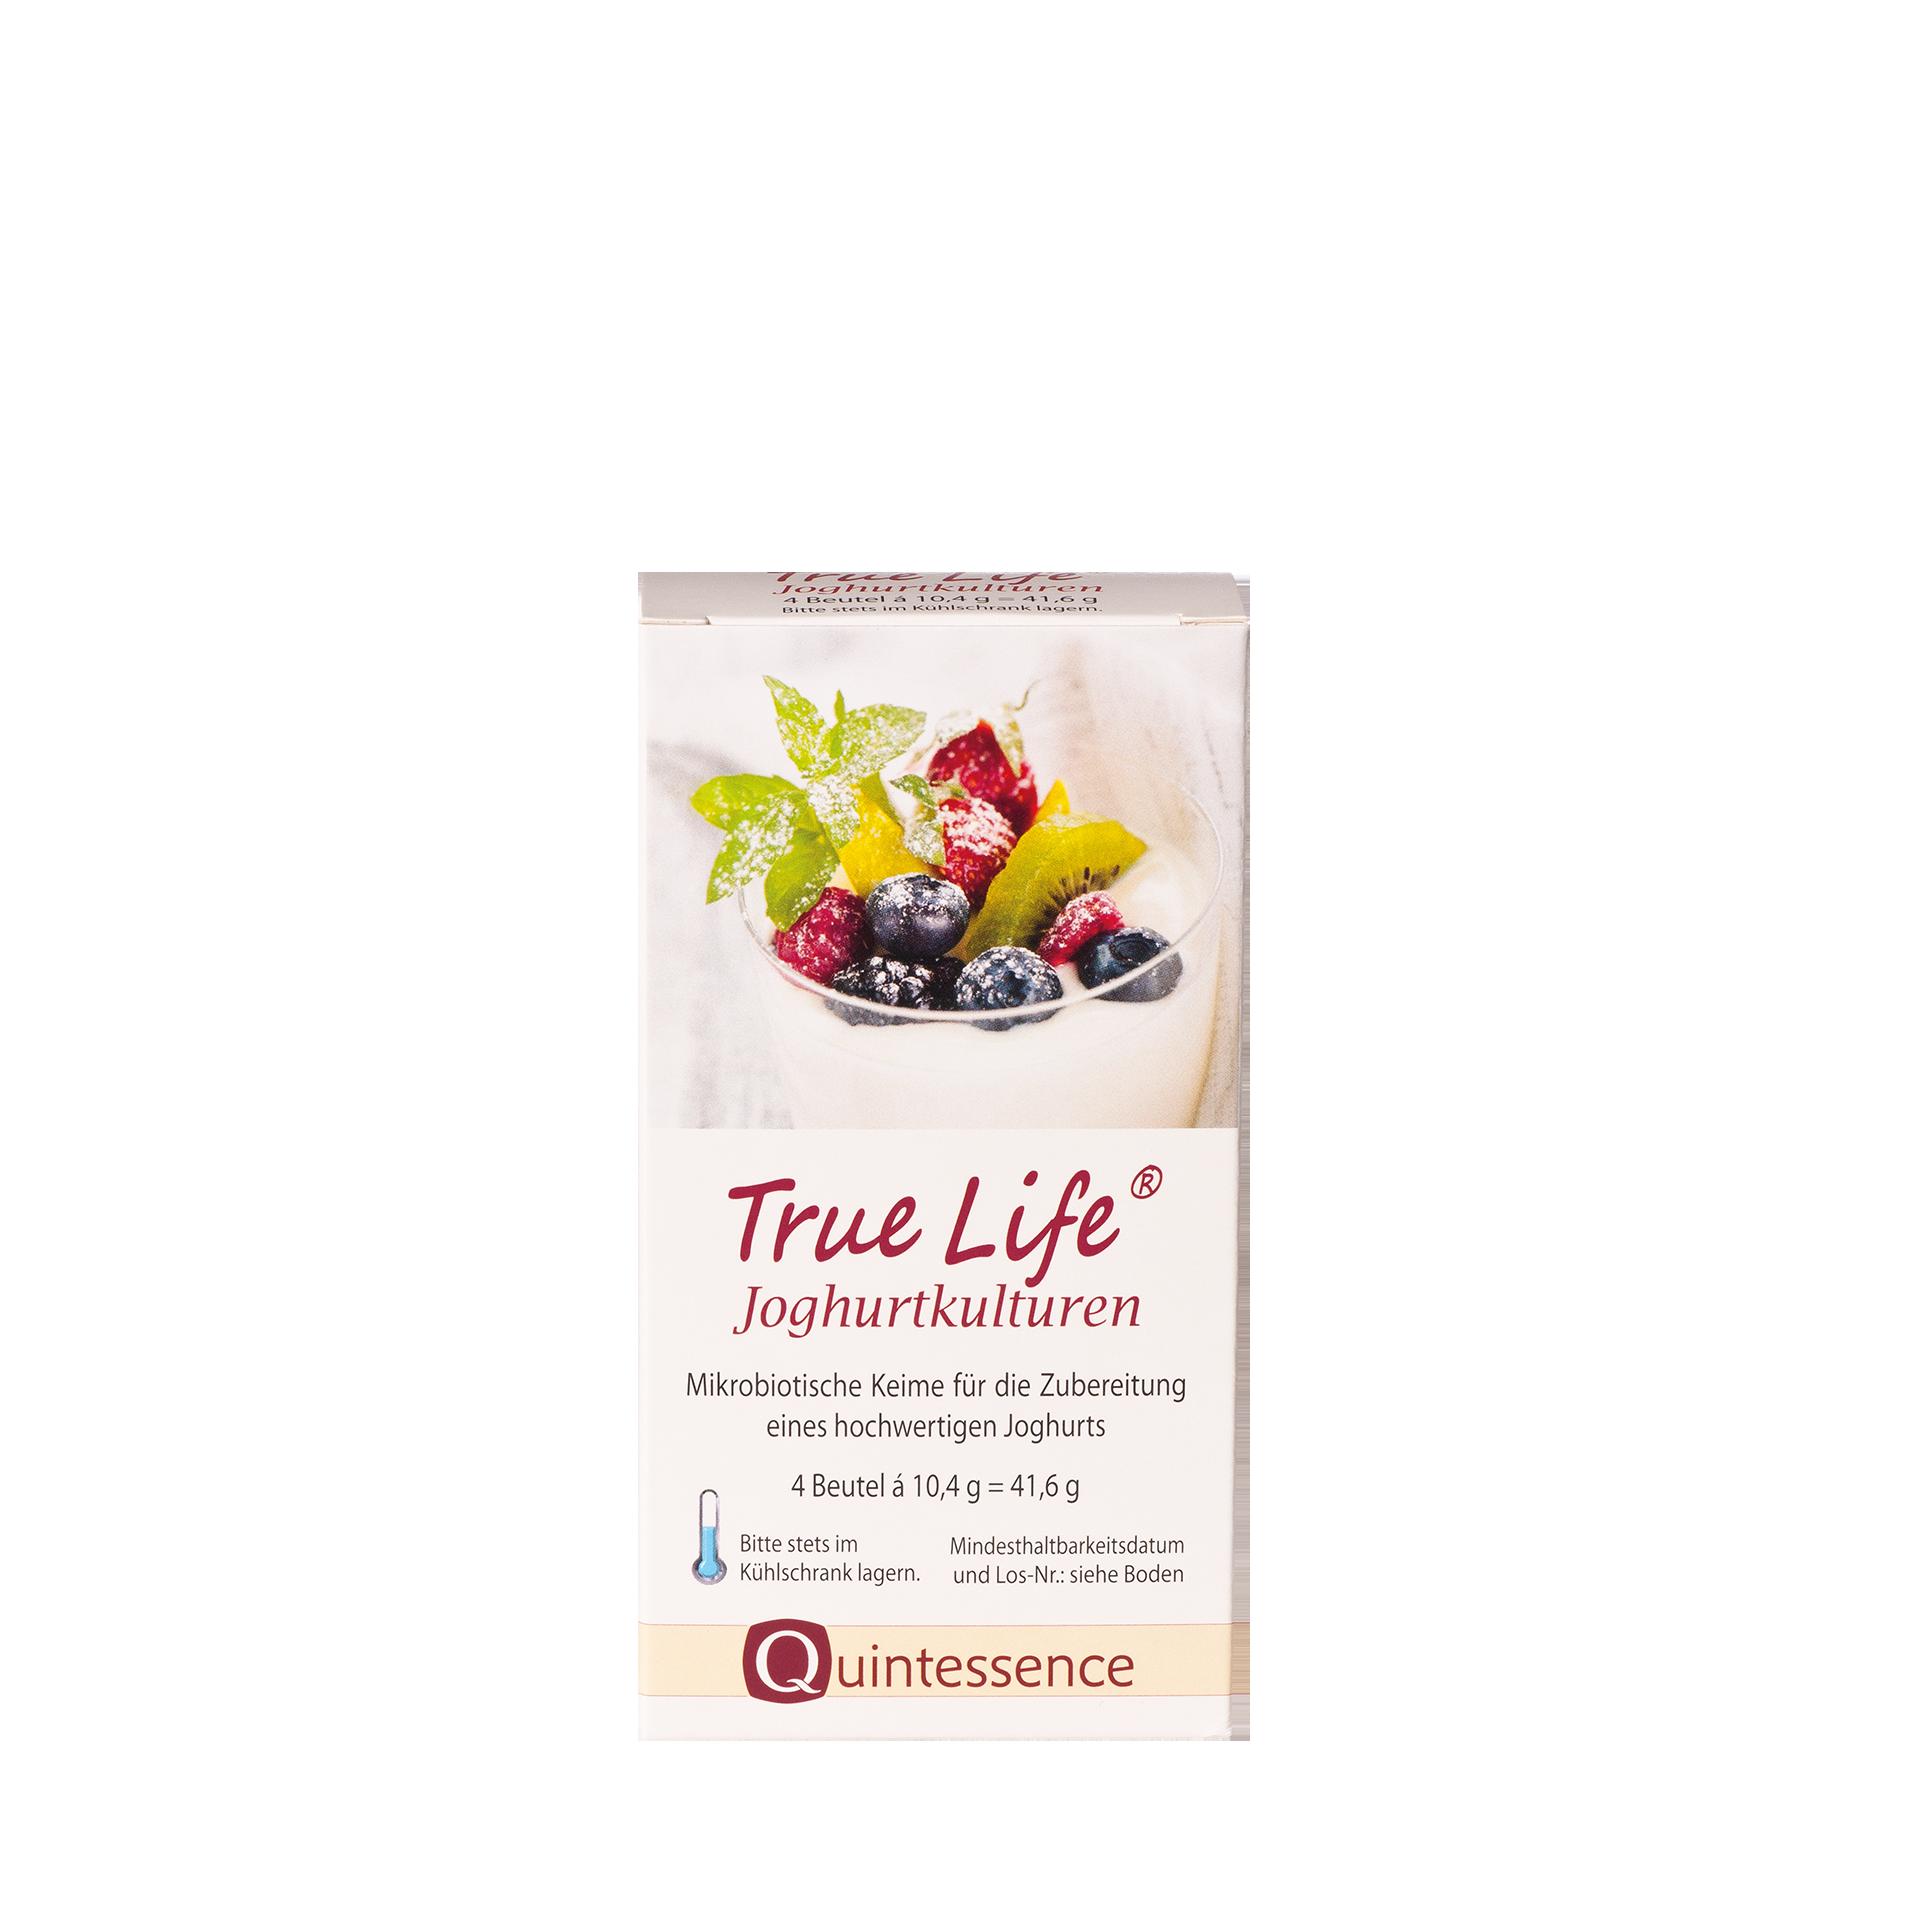 True Life Joghurtkulturen, 4 Beutel à 10,4 g